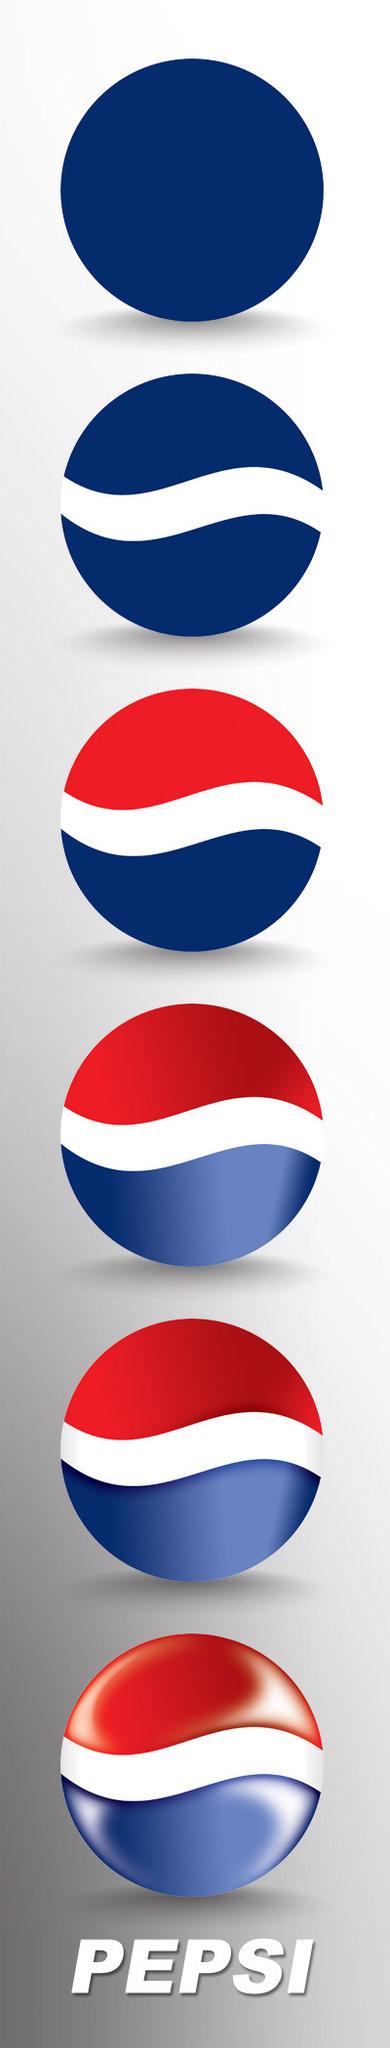 Pepsi Logo By AnubisGraph